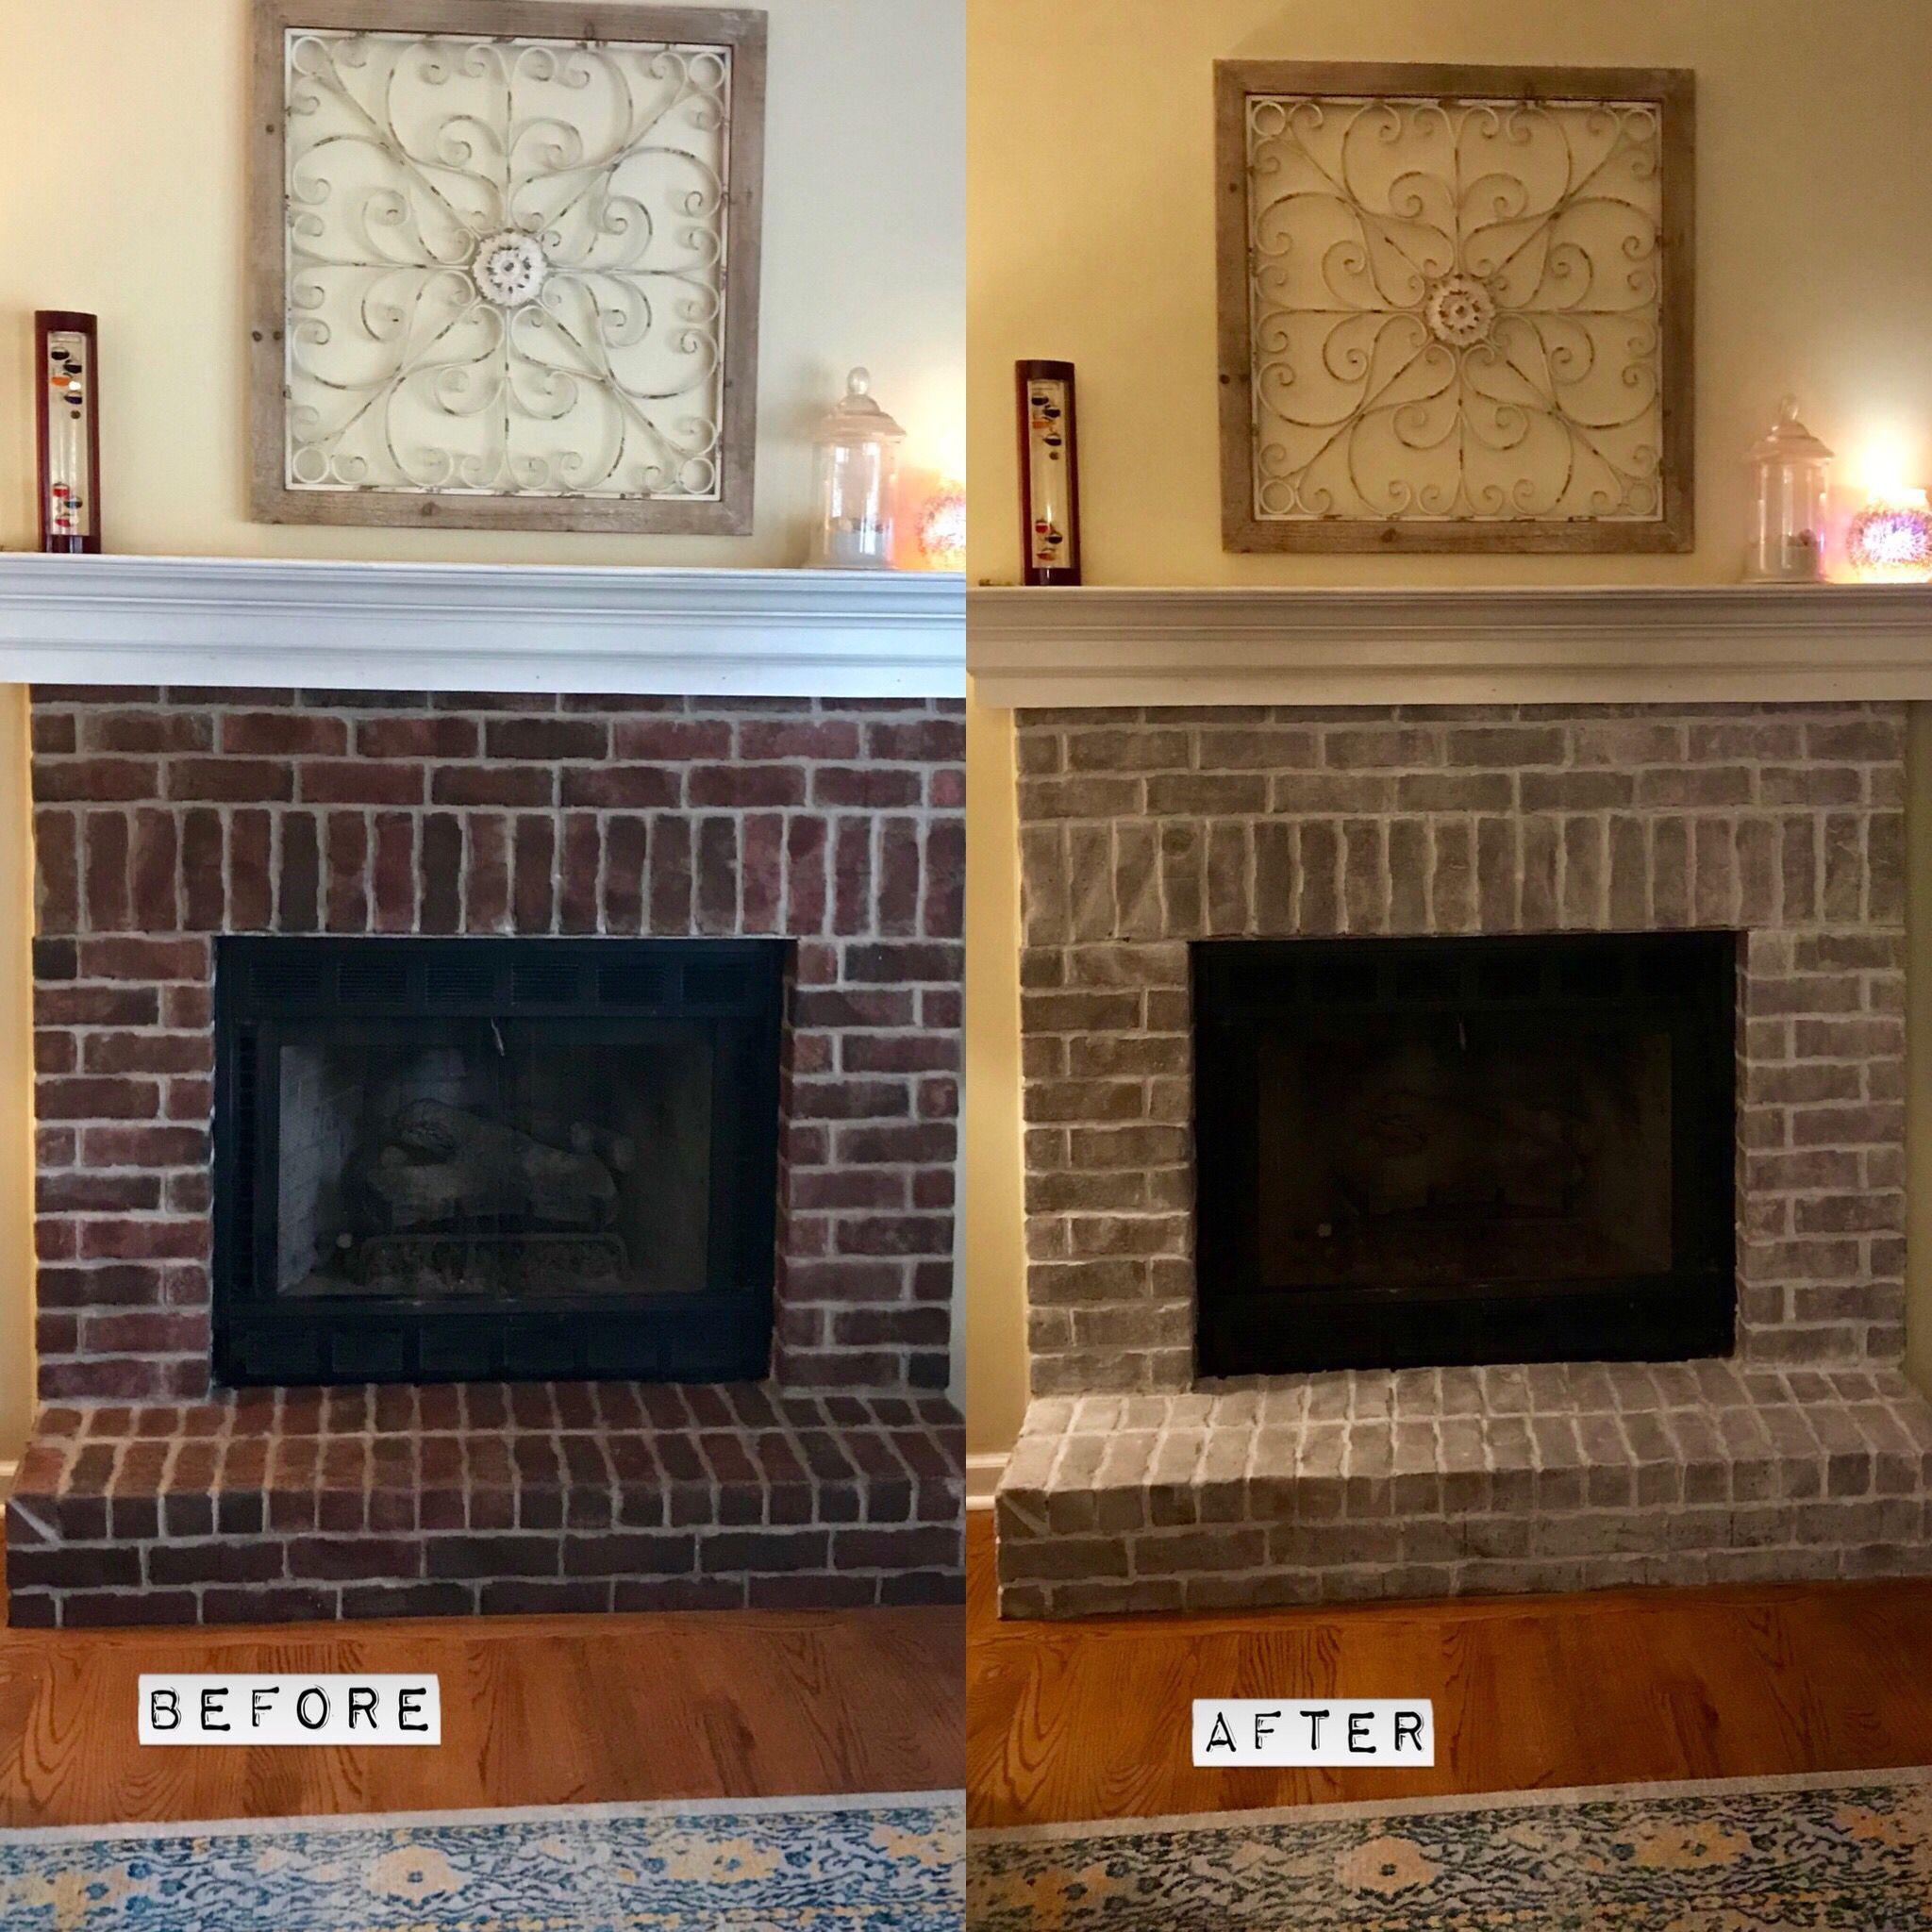 Whitewashed brick fireplace ElectricFireplace Electric Fireplace